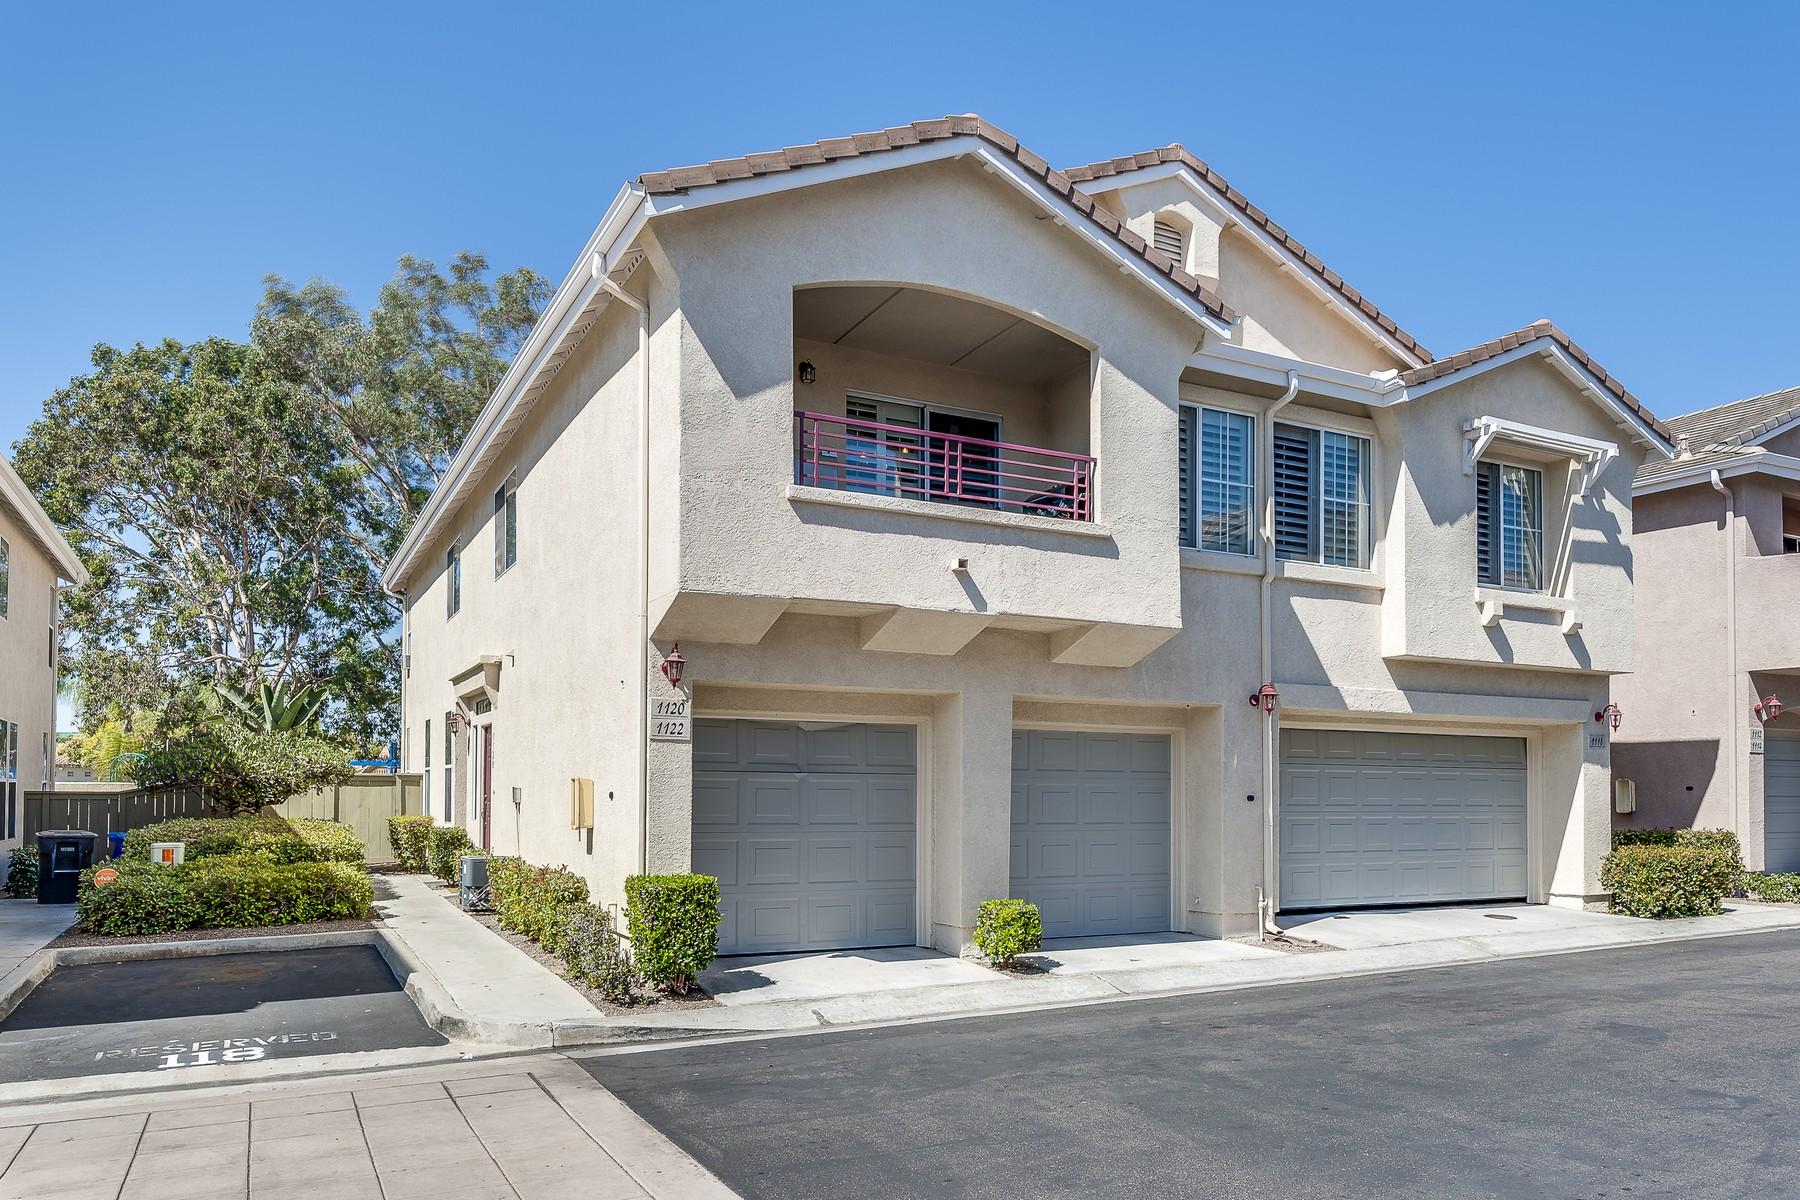 1120 Magellan Way, Chula Vista, CA 91910